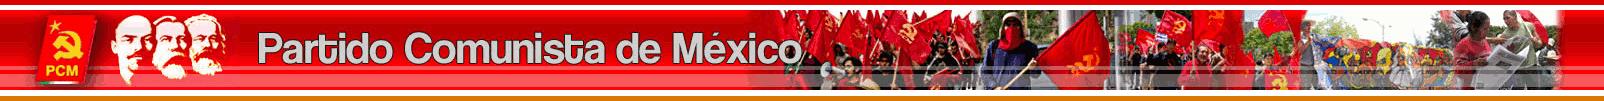 Partido Comunista de Mexico